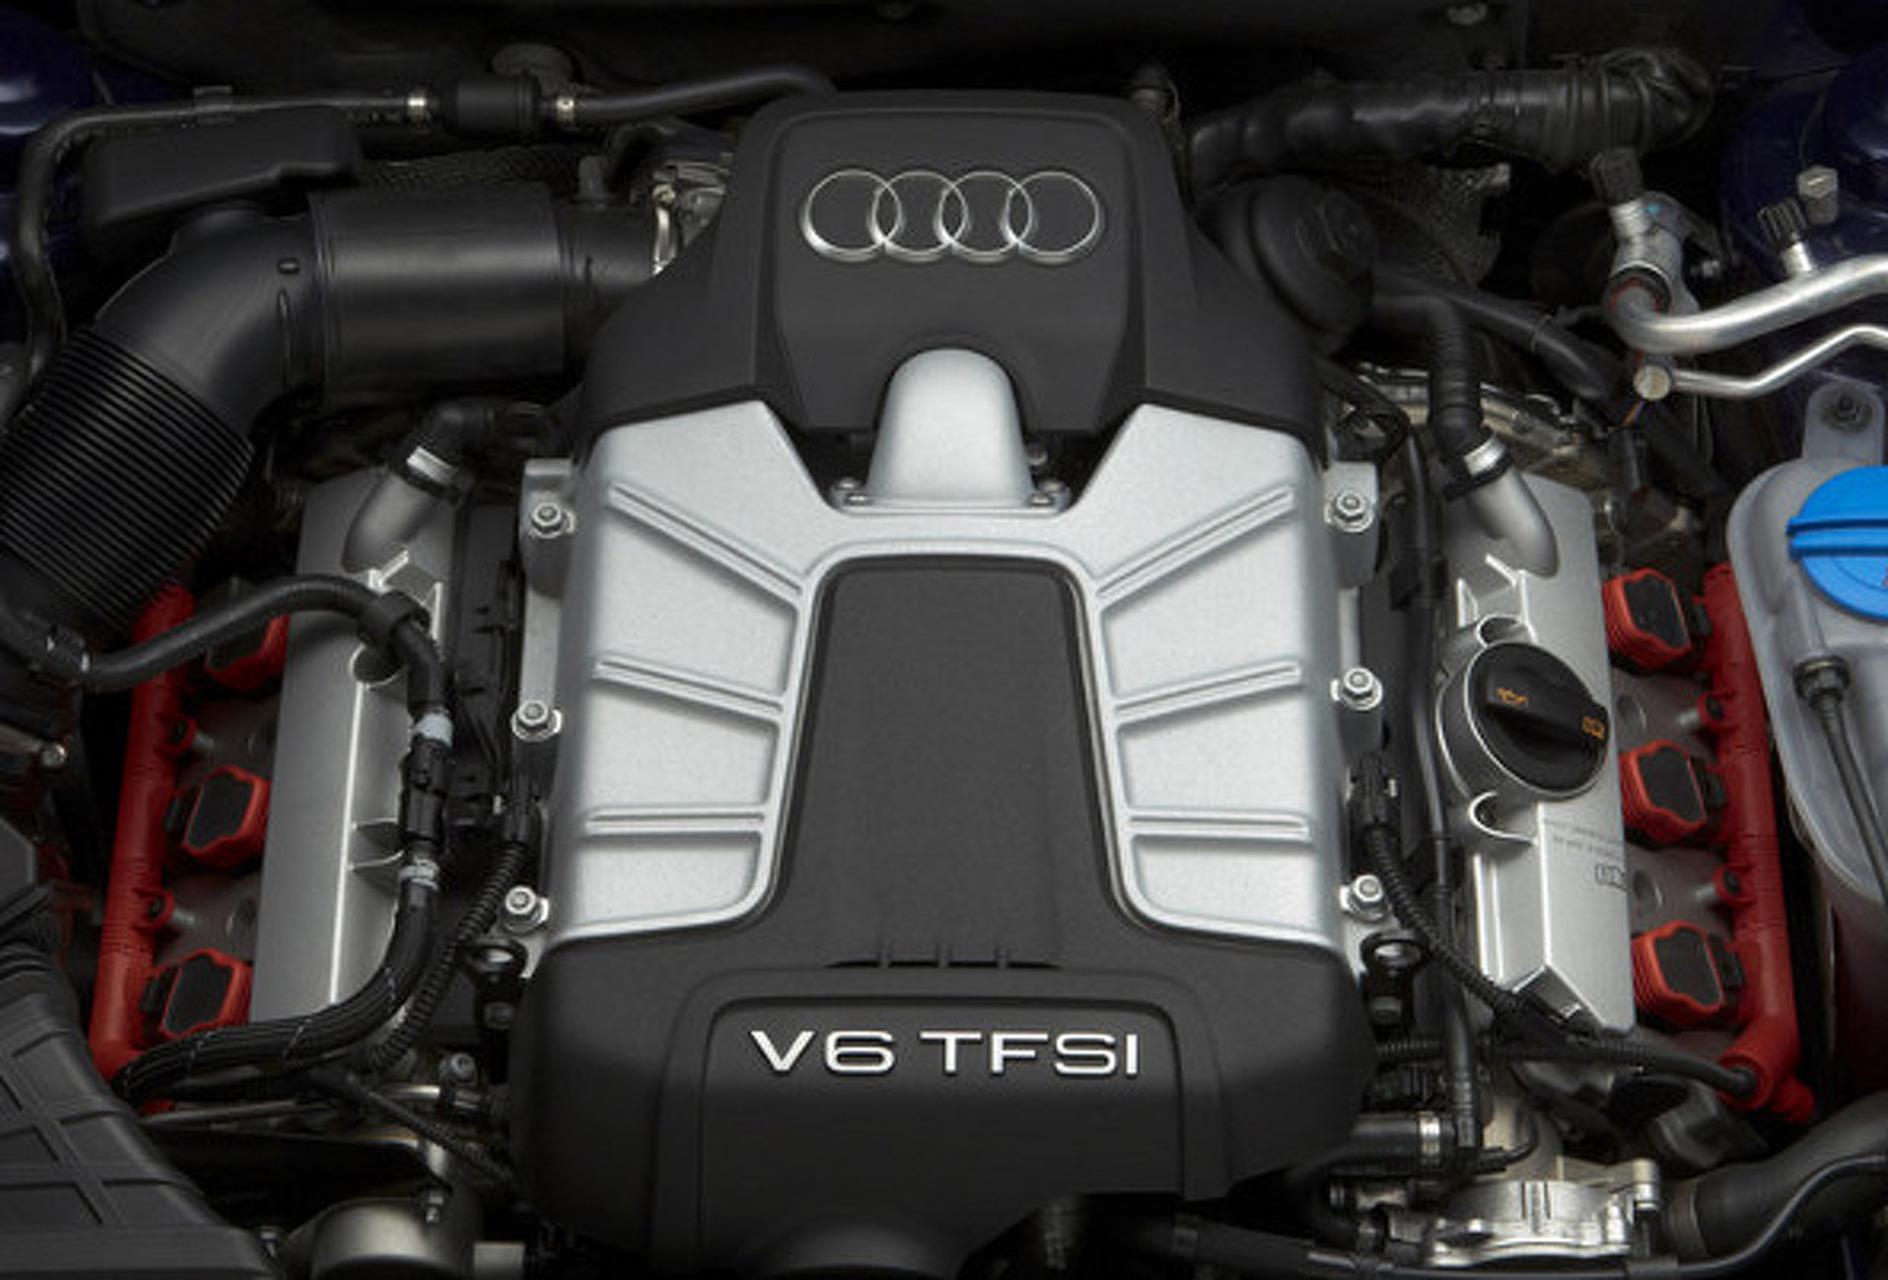 Wards Ten Best Engines Announced